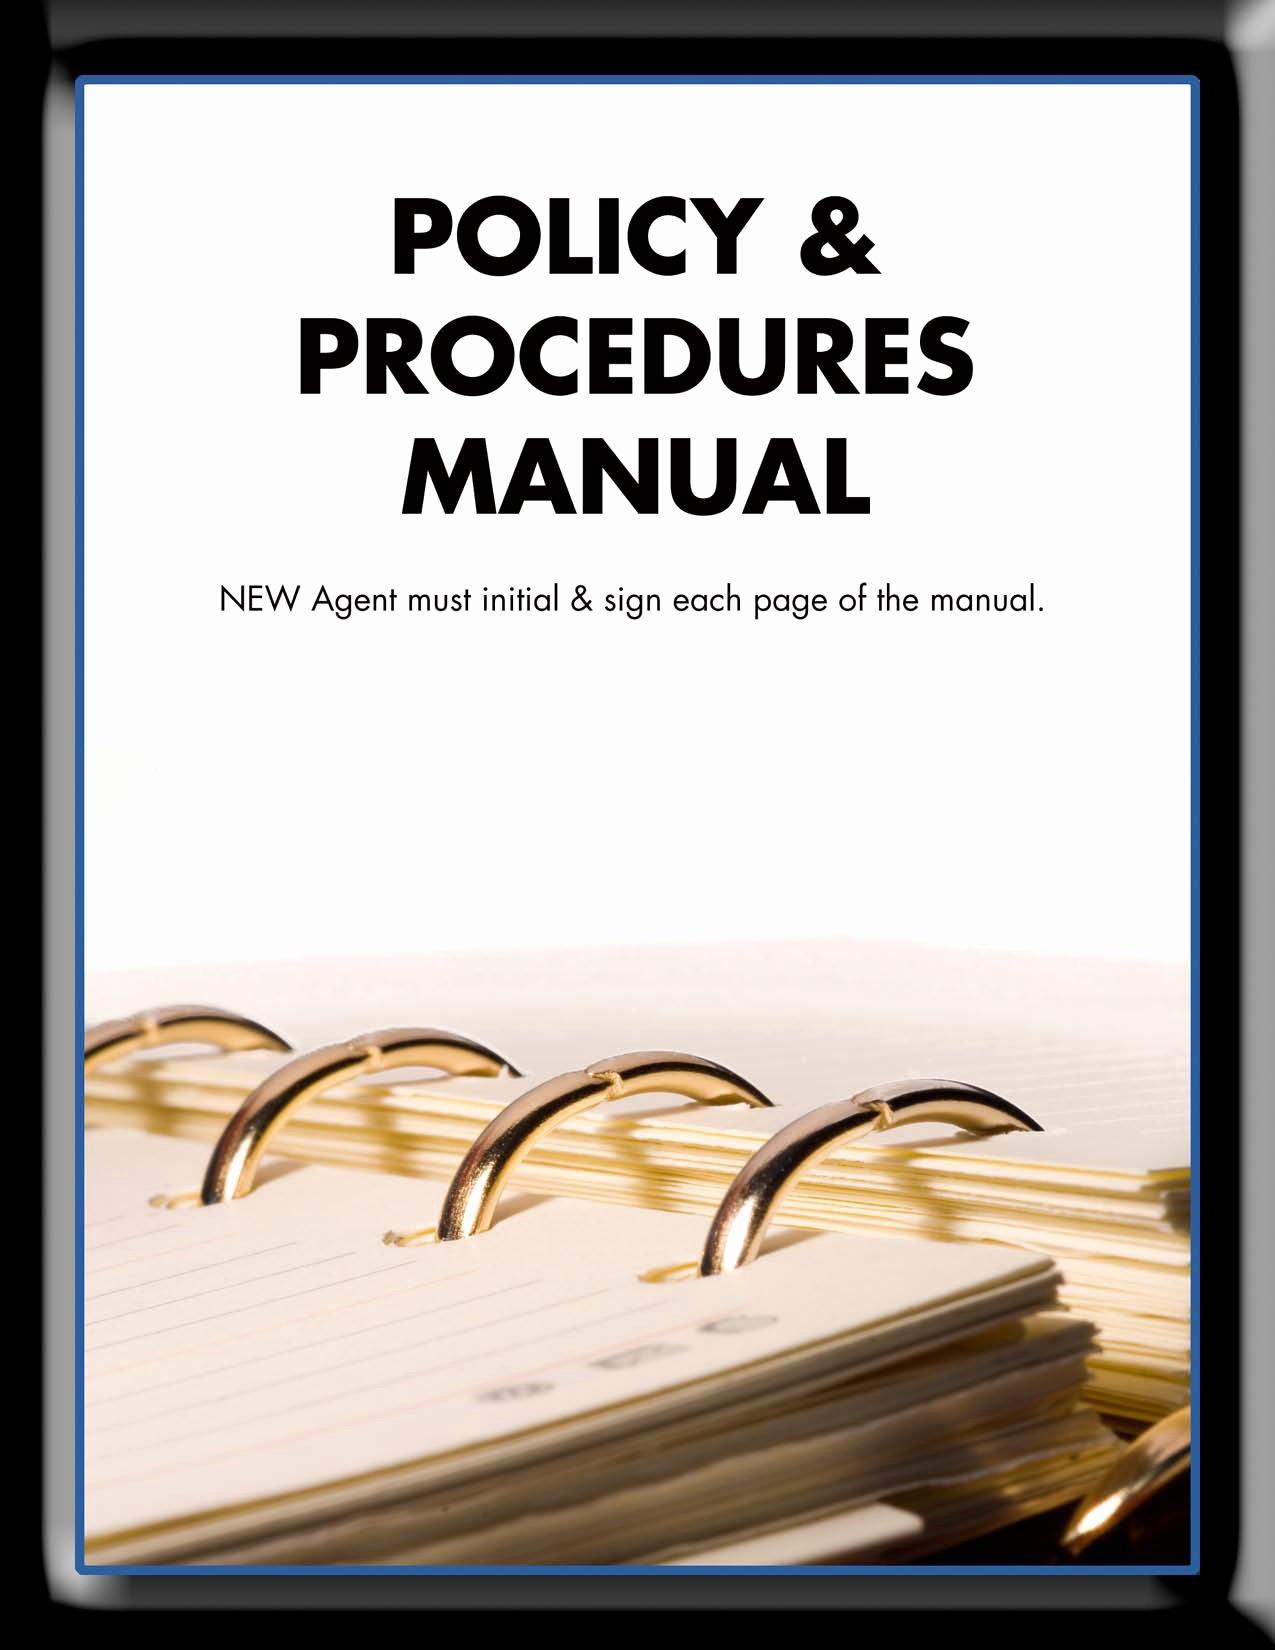 Policy Manual Sample Fresh February 2013